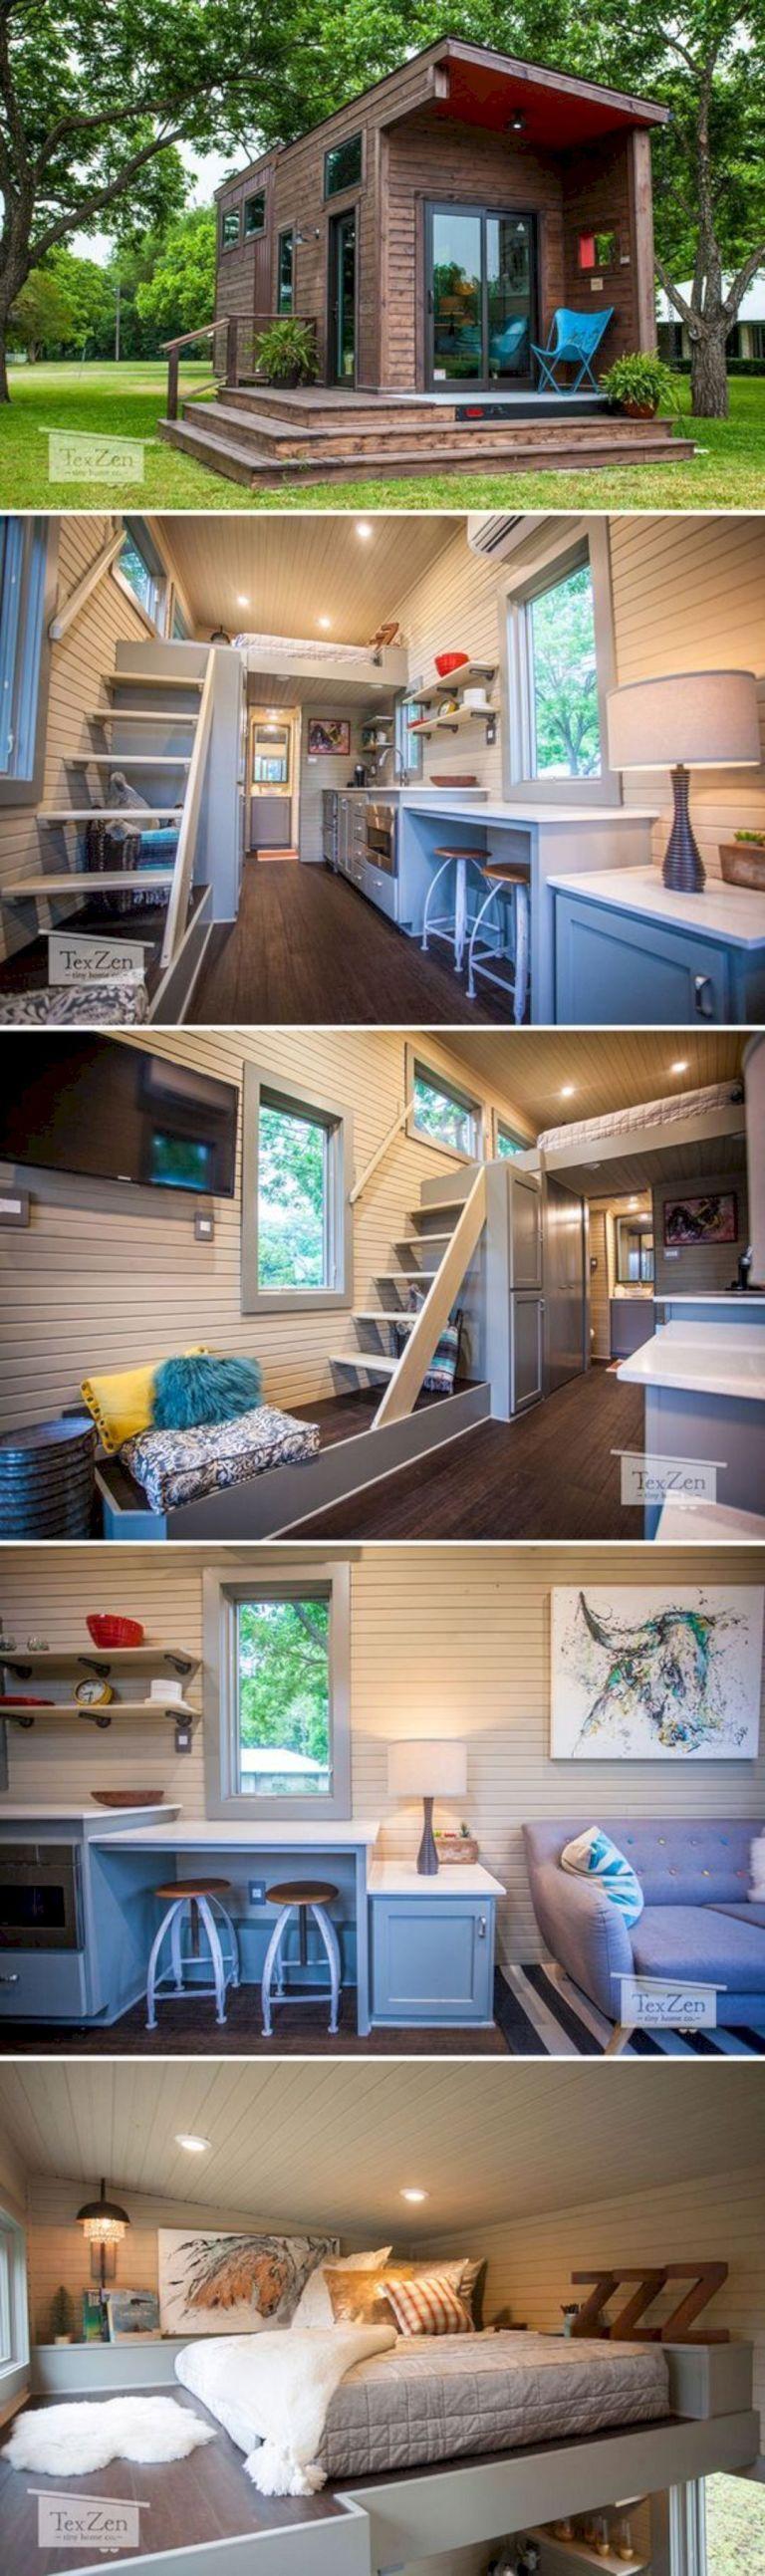 15 Amazing Interior Design Ideas For Modern Loft